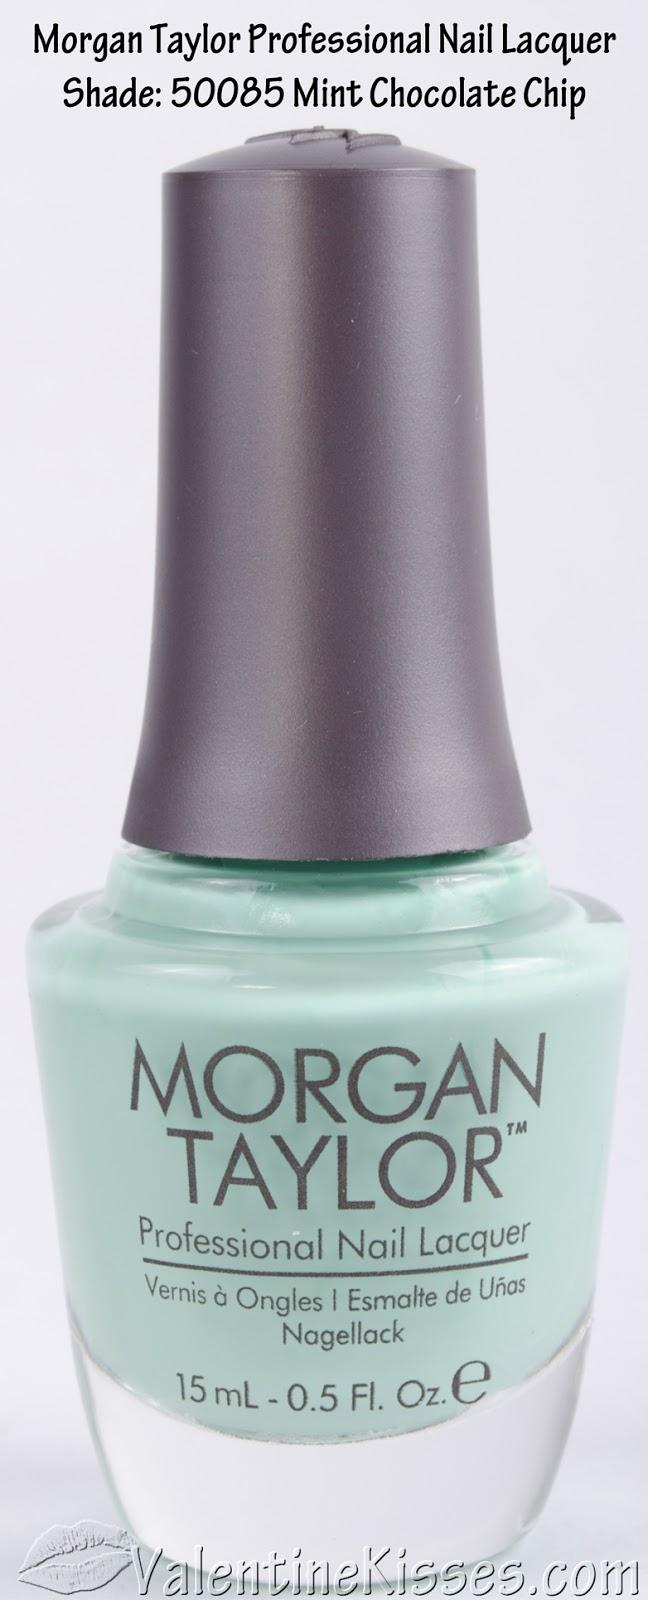 Valentine Kisses: Morgan Taylor Professional Nail Lacquer